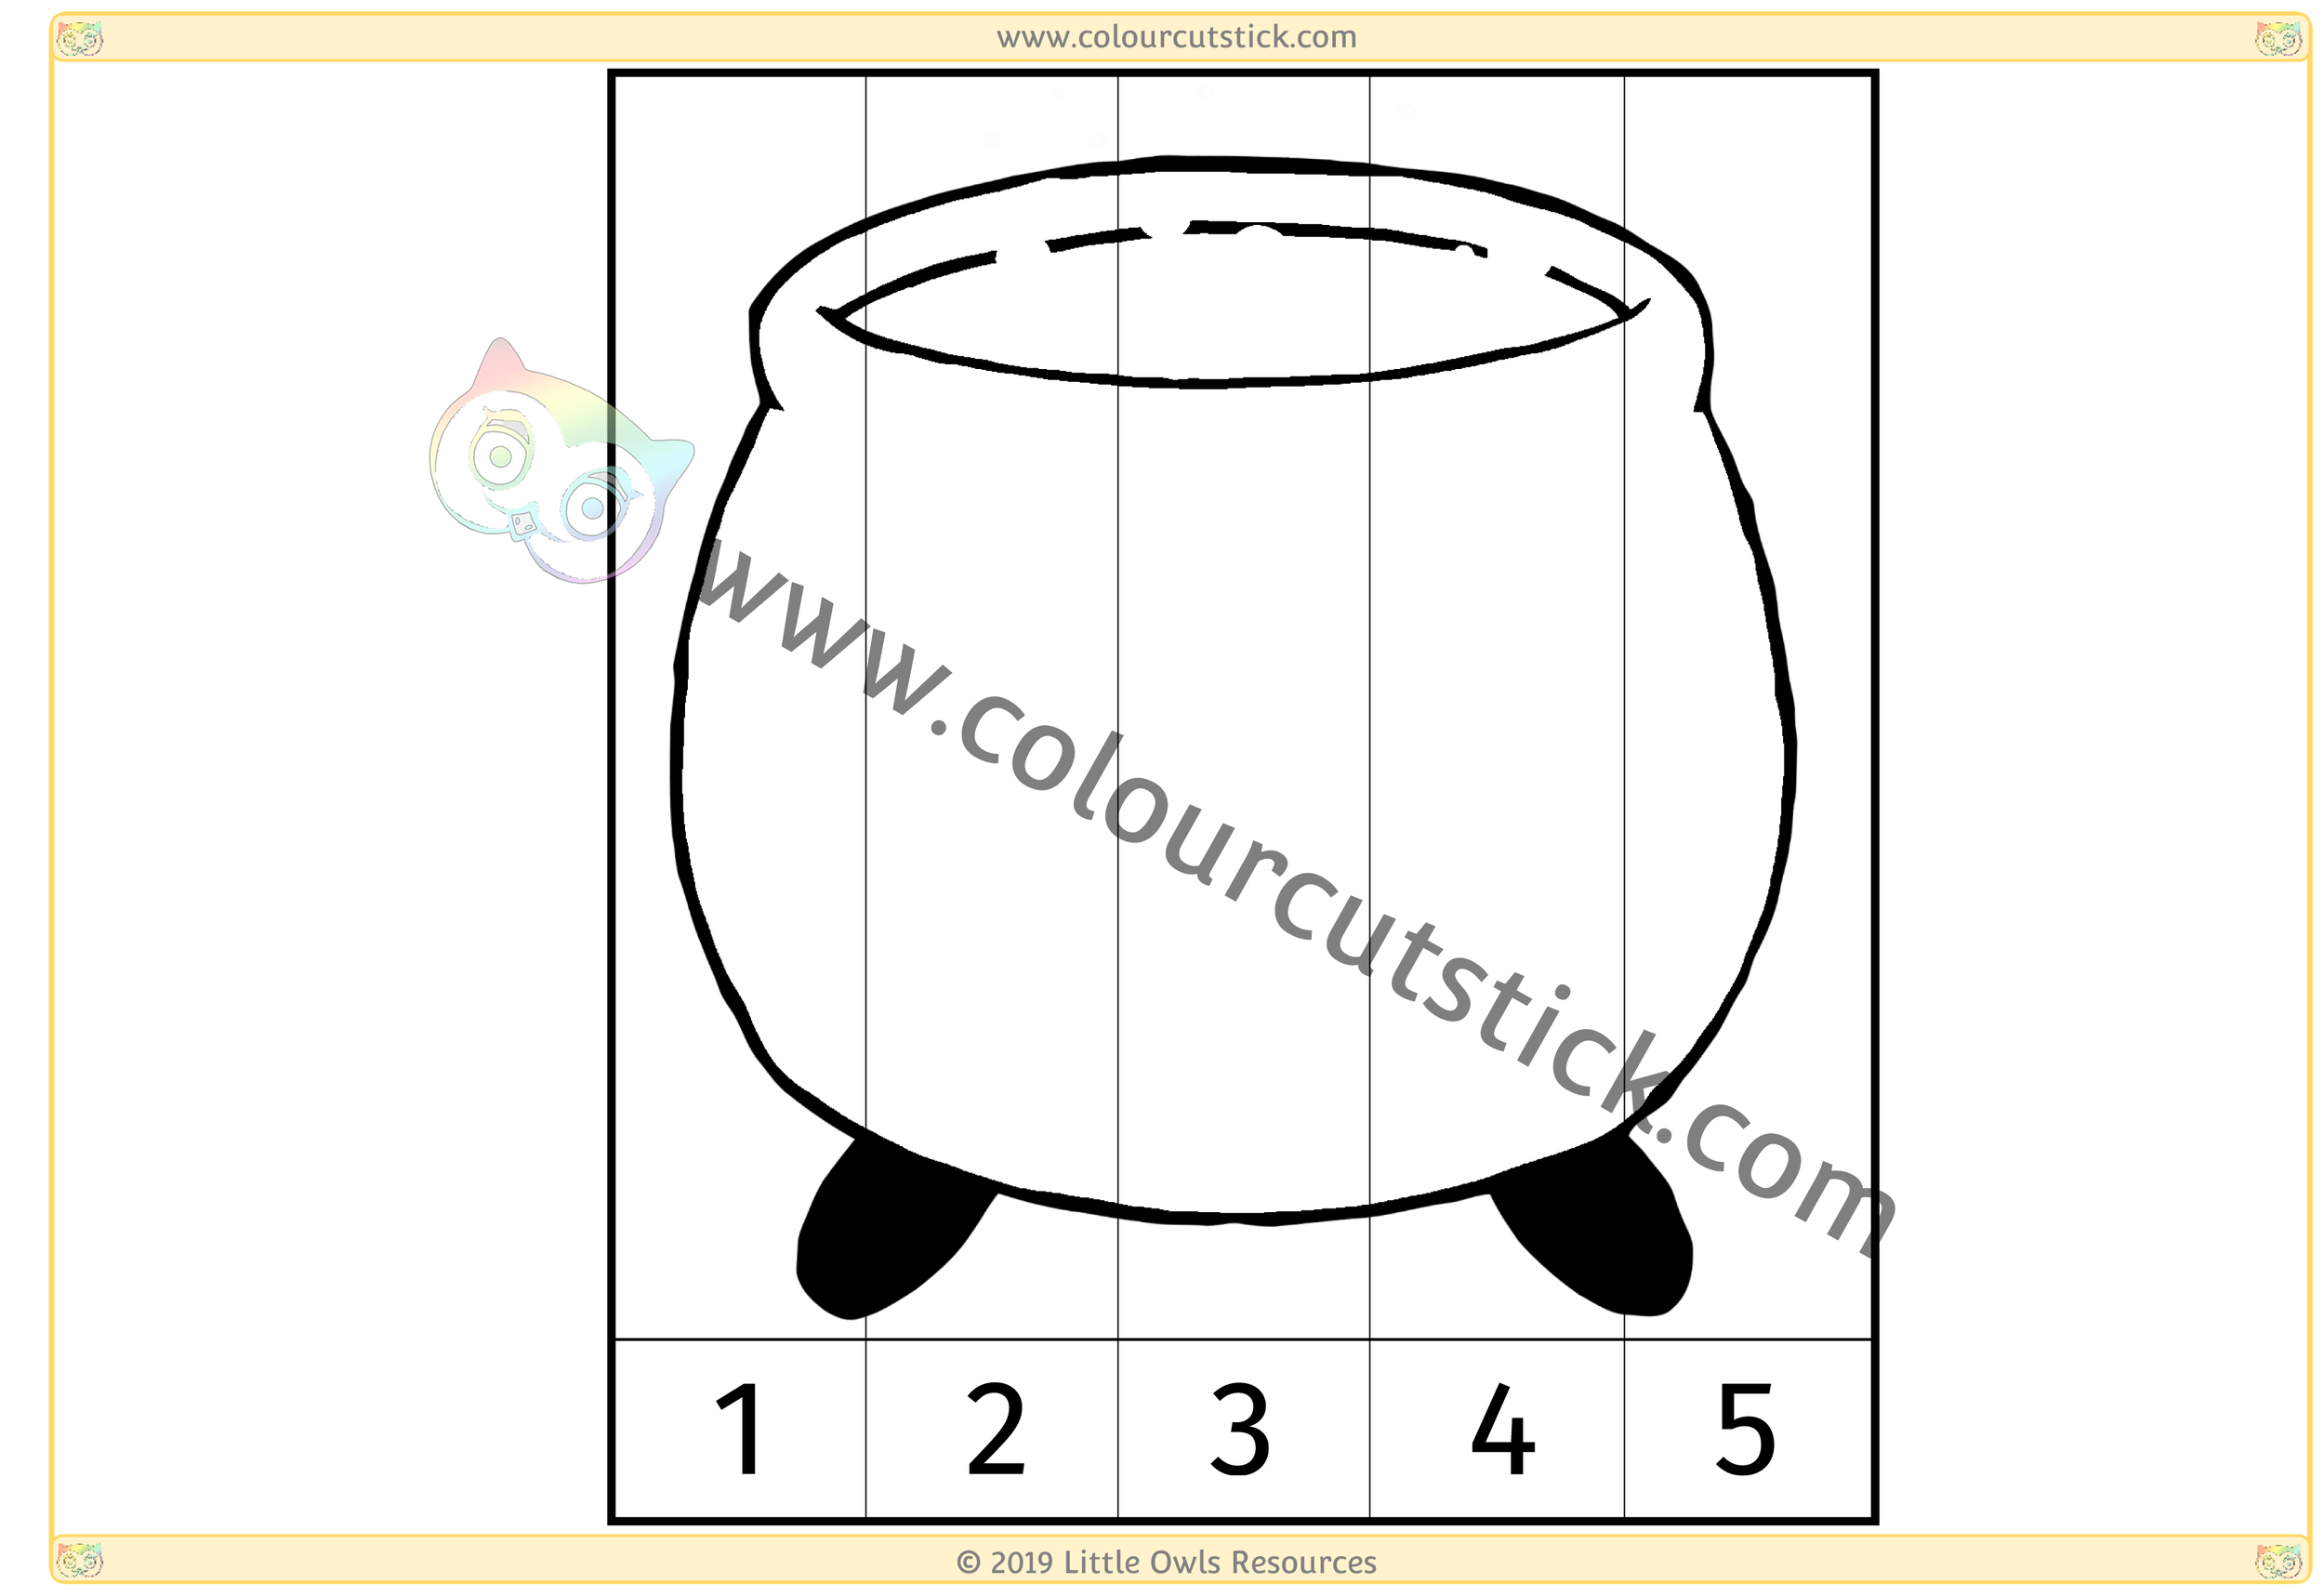 Cauldron Number Slice Puzzle 1-5 -